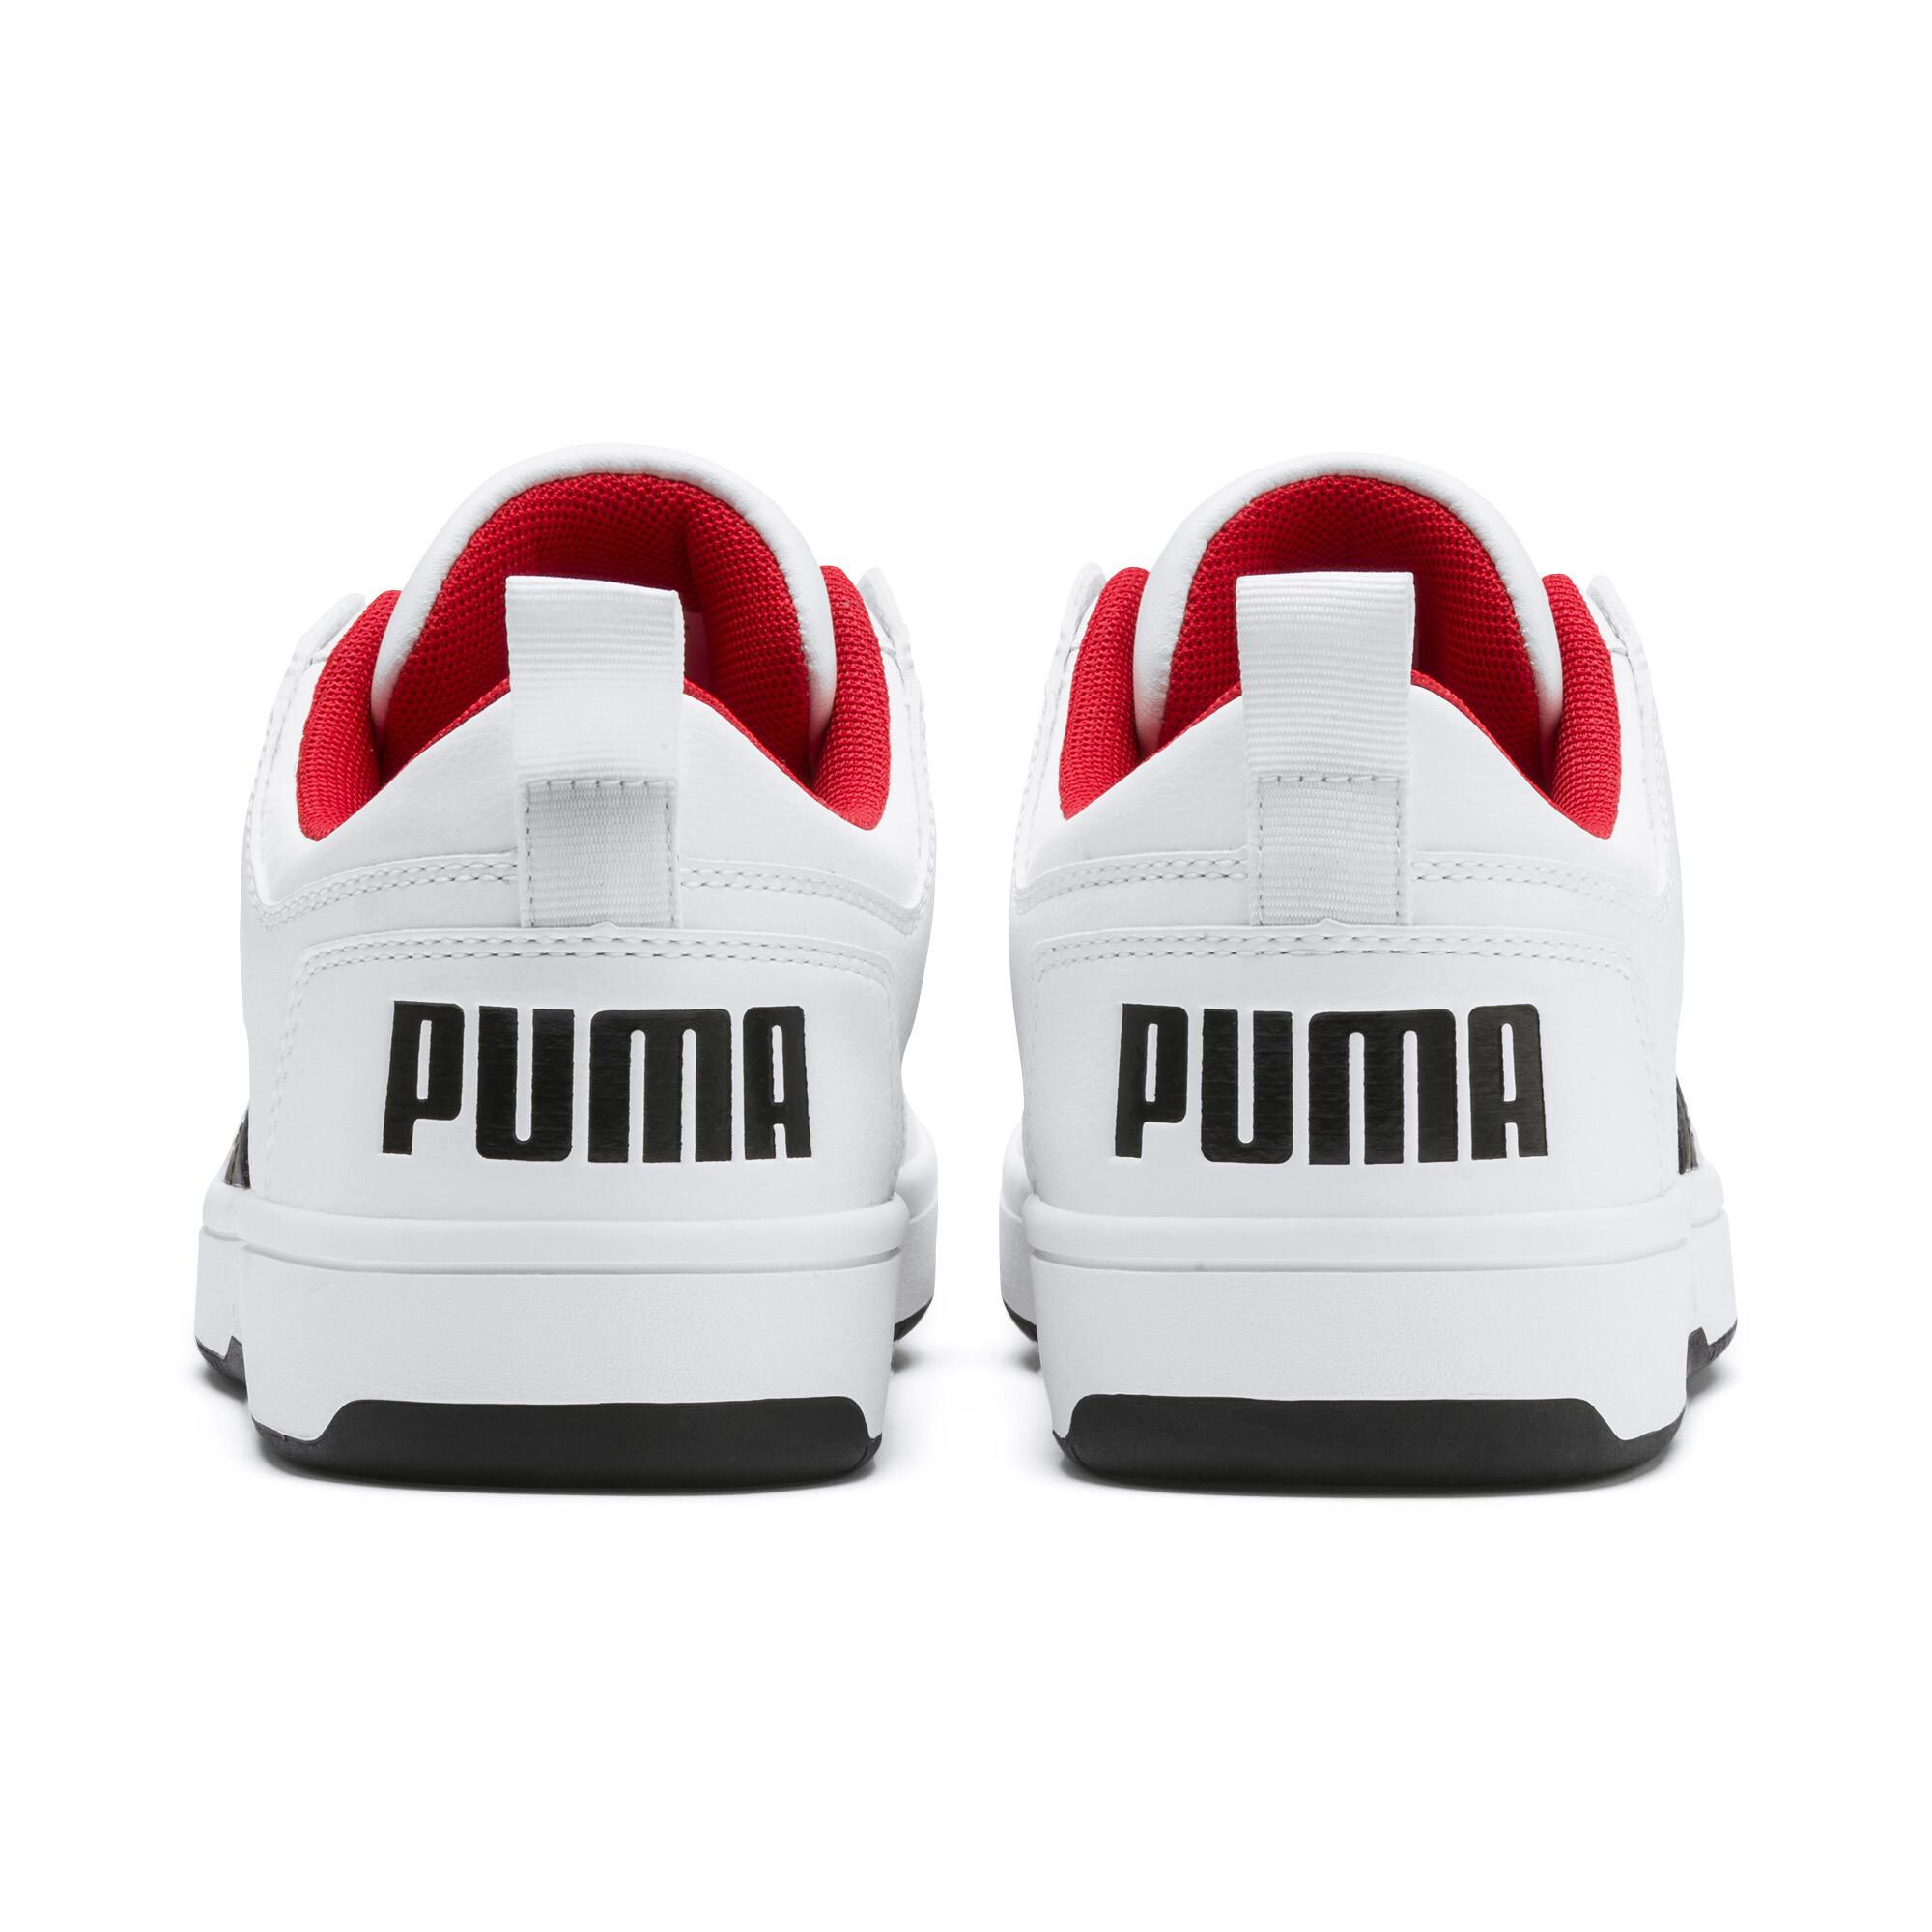 PUMA-PUMA-Rebound-LayUp-Lo-Men-039-s-Sneakers-Men-Shoe-Basics miniatura 12